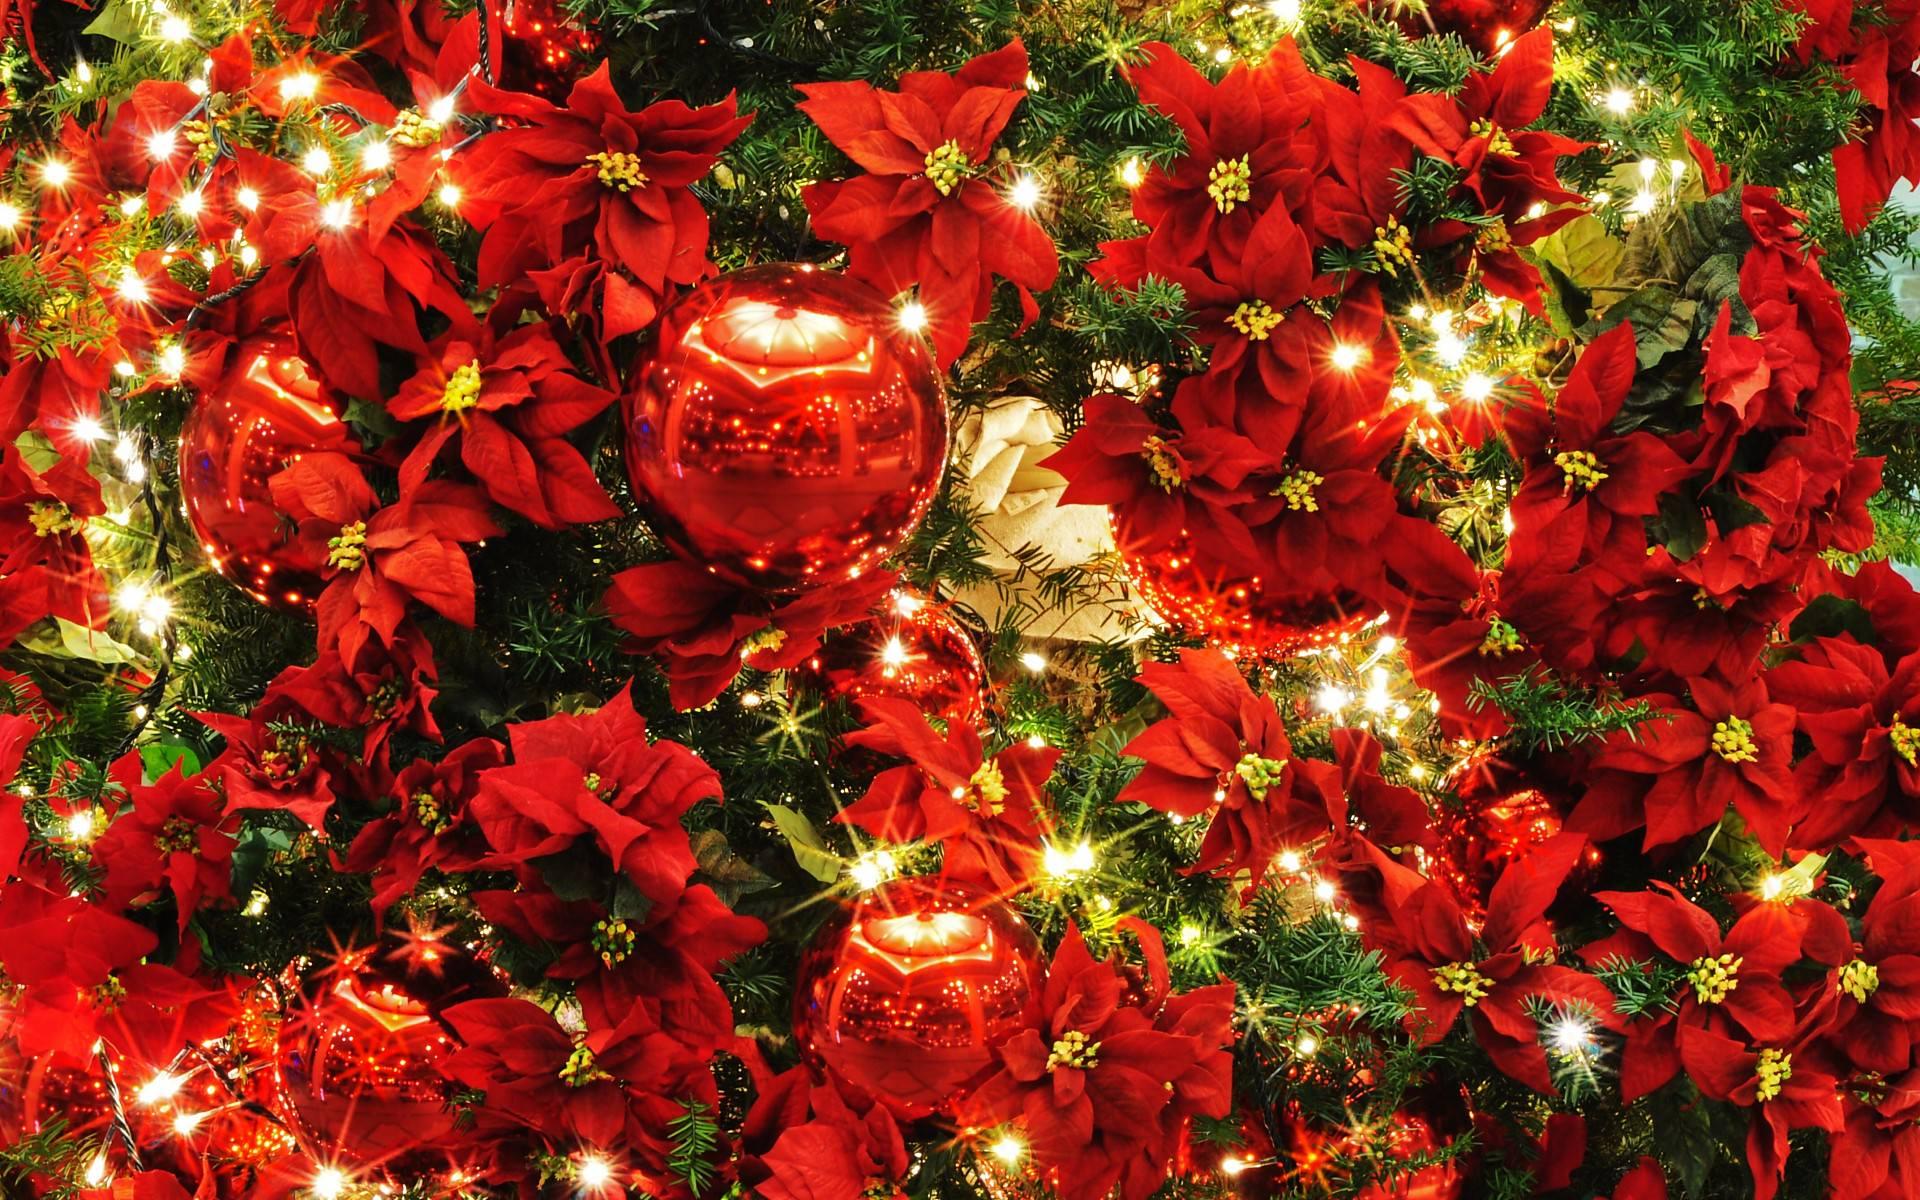 Pc用クリスマスの壁紙 1920 1200 51 Wallpaperbox